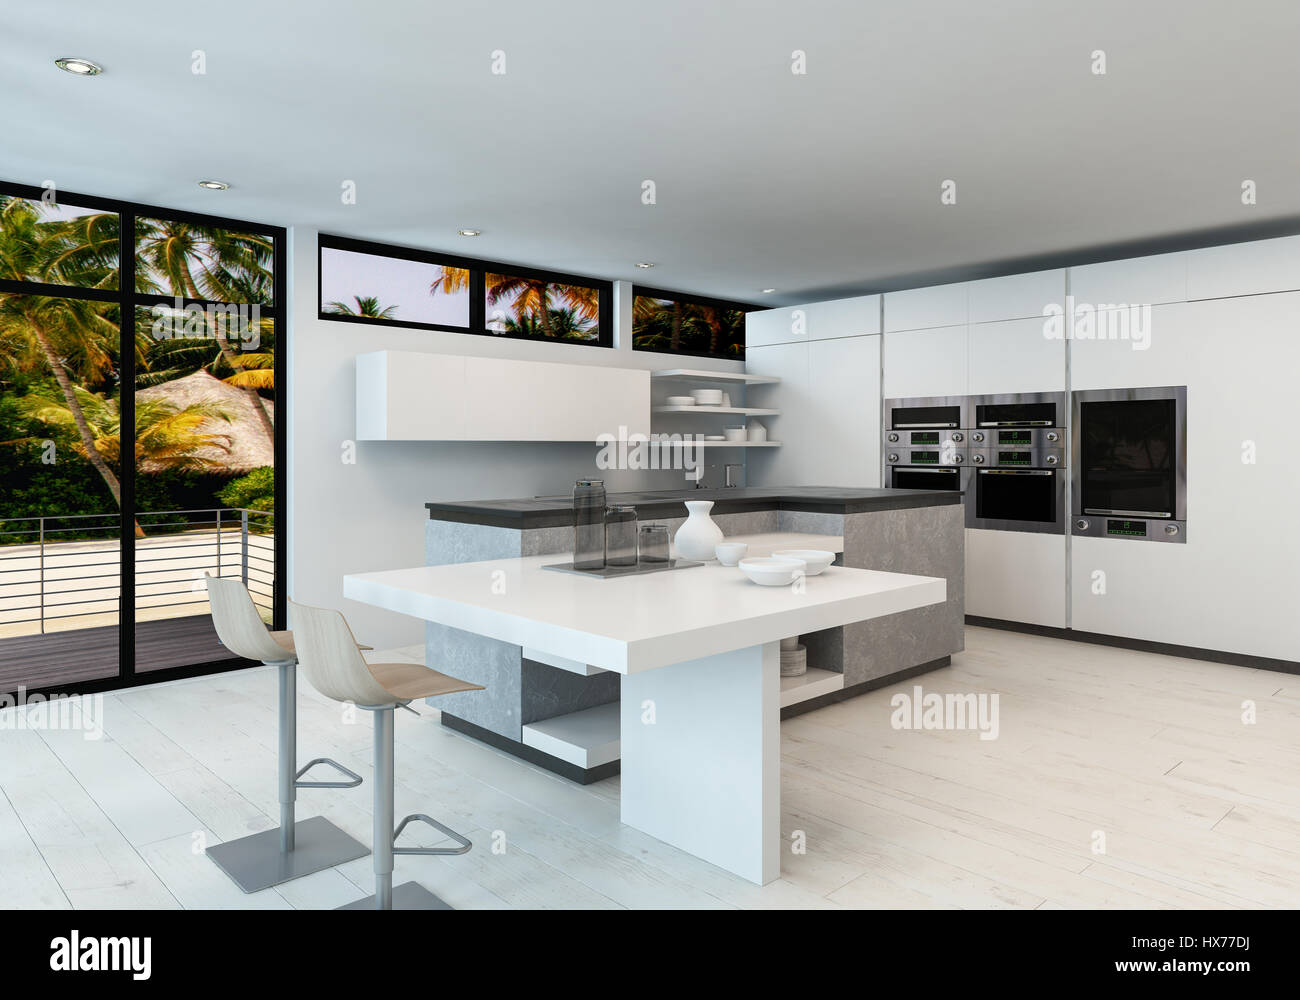 Moderno bianco pulito cucina a pianta aperta interno con bancone bar ...